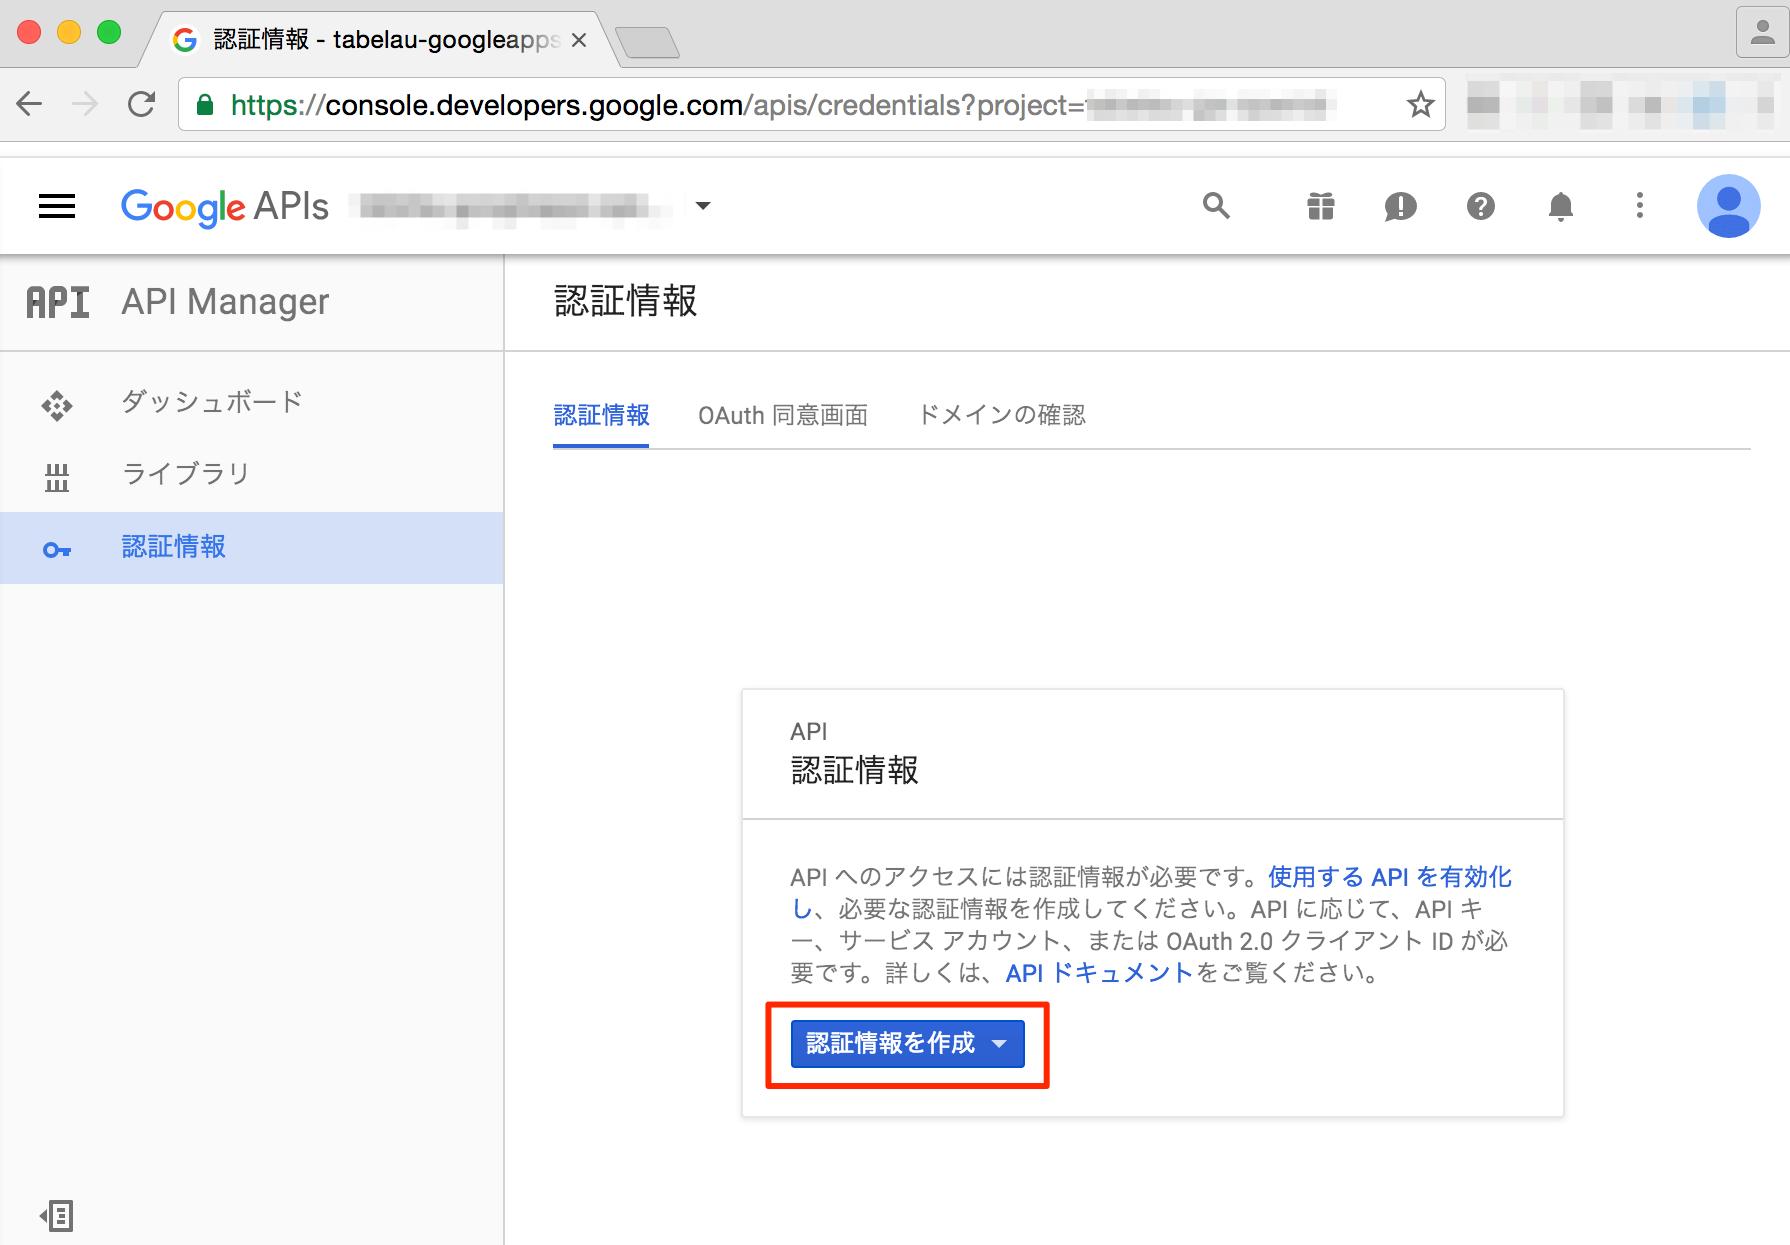 tableau-googleapps-openid-integration_03